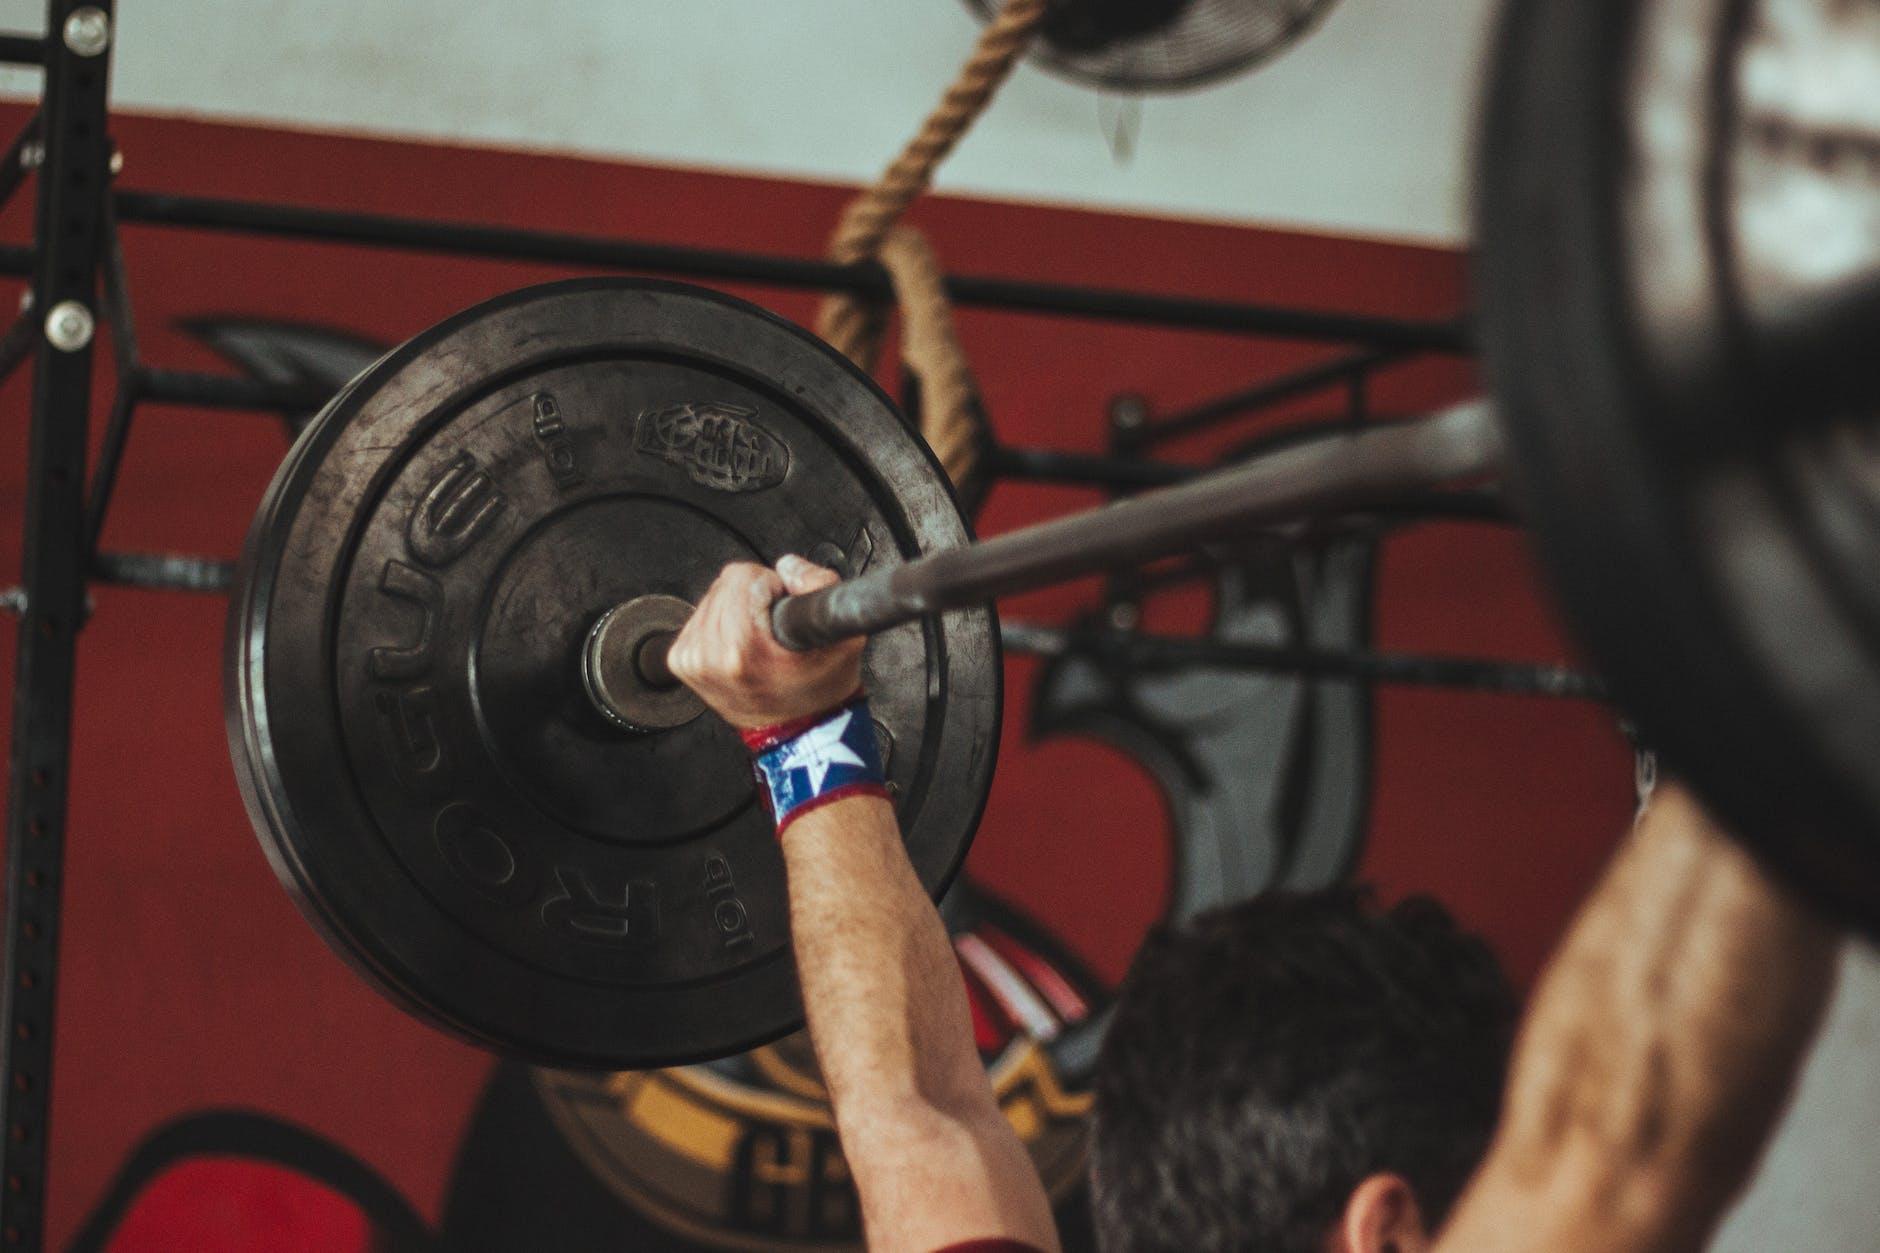 weight lifting 5x5 workout